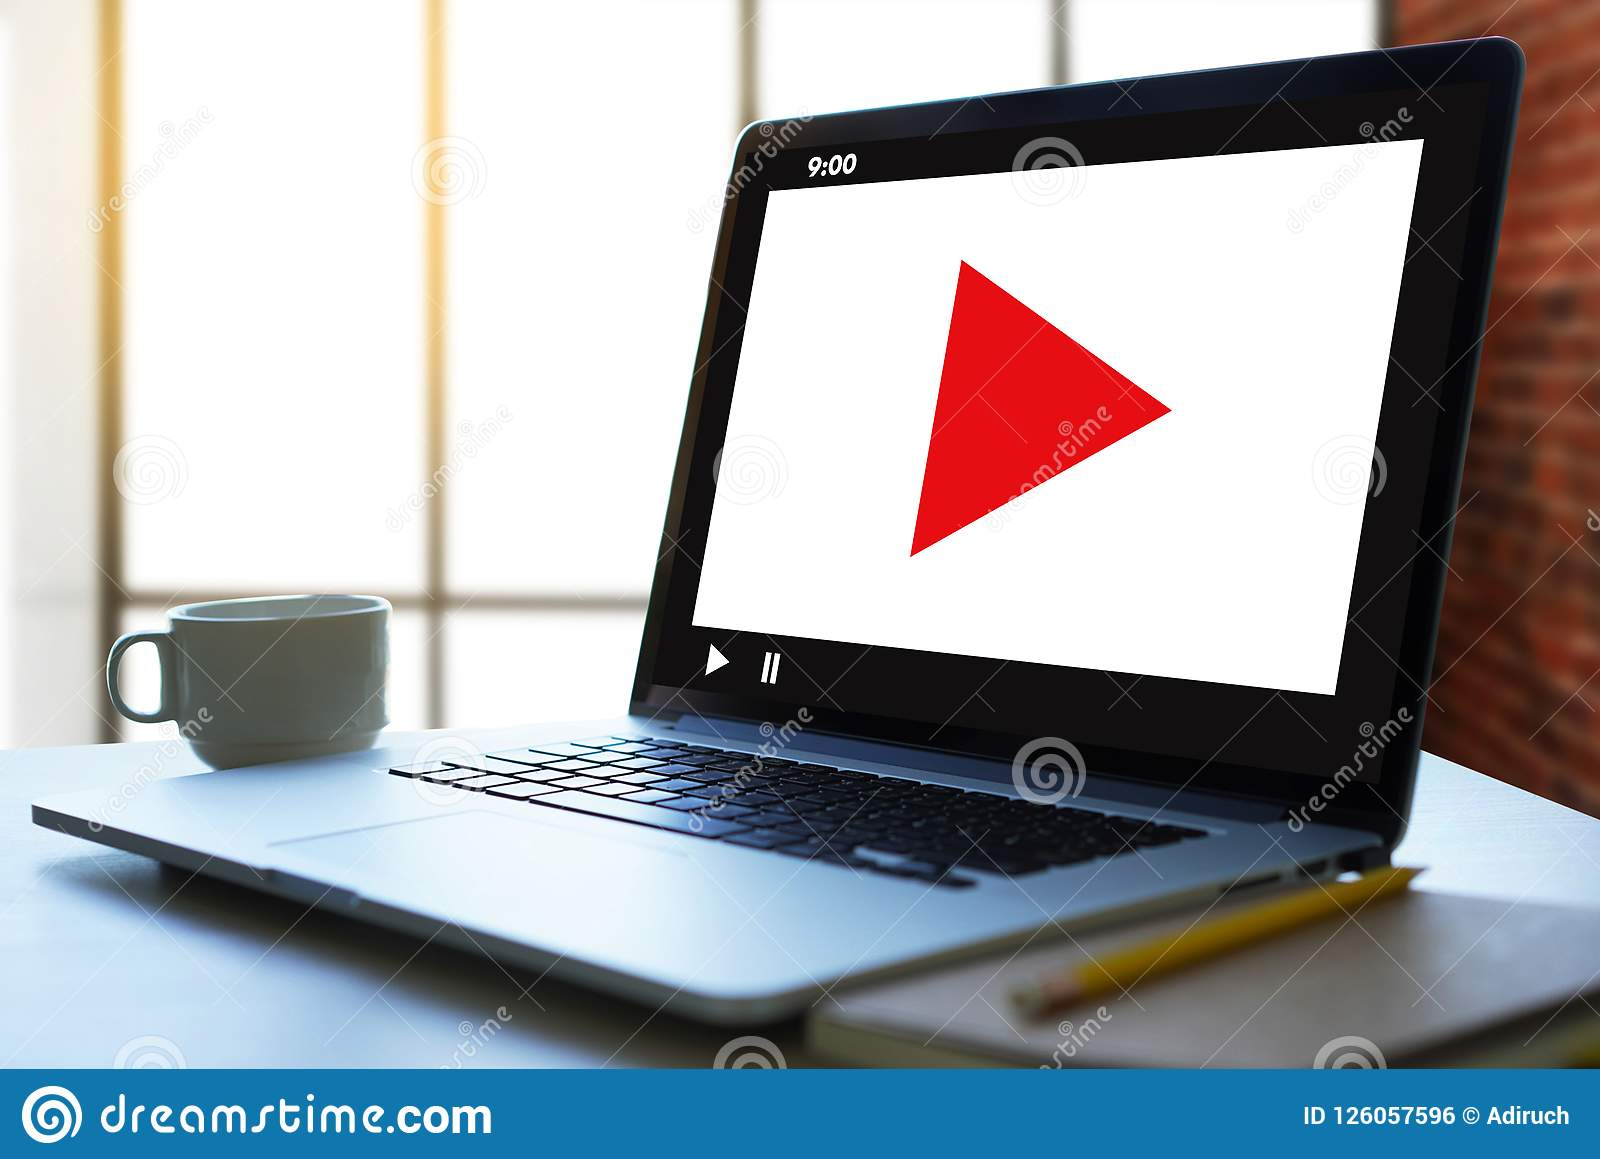 VIDEO MARKETING Audio Video , Market Interactive Channels